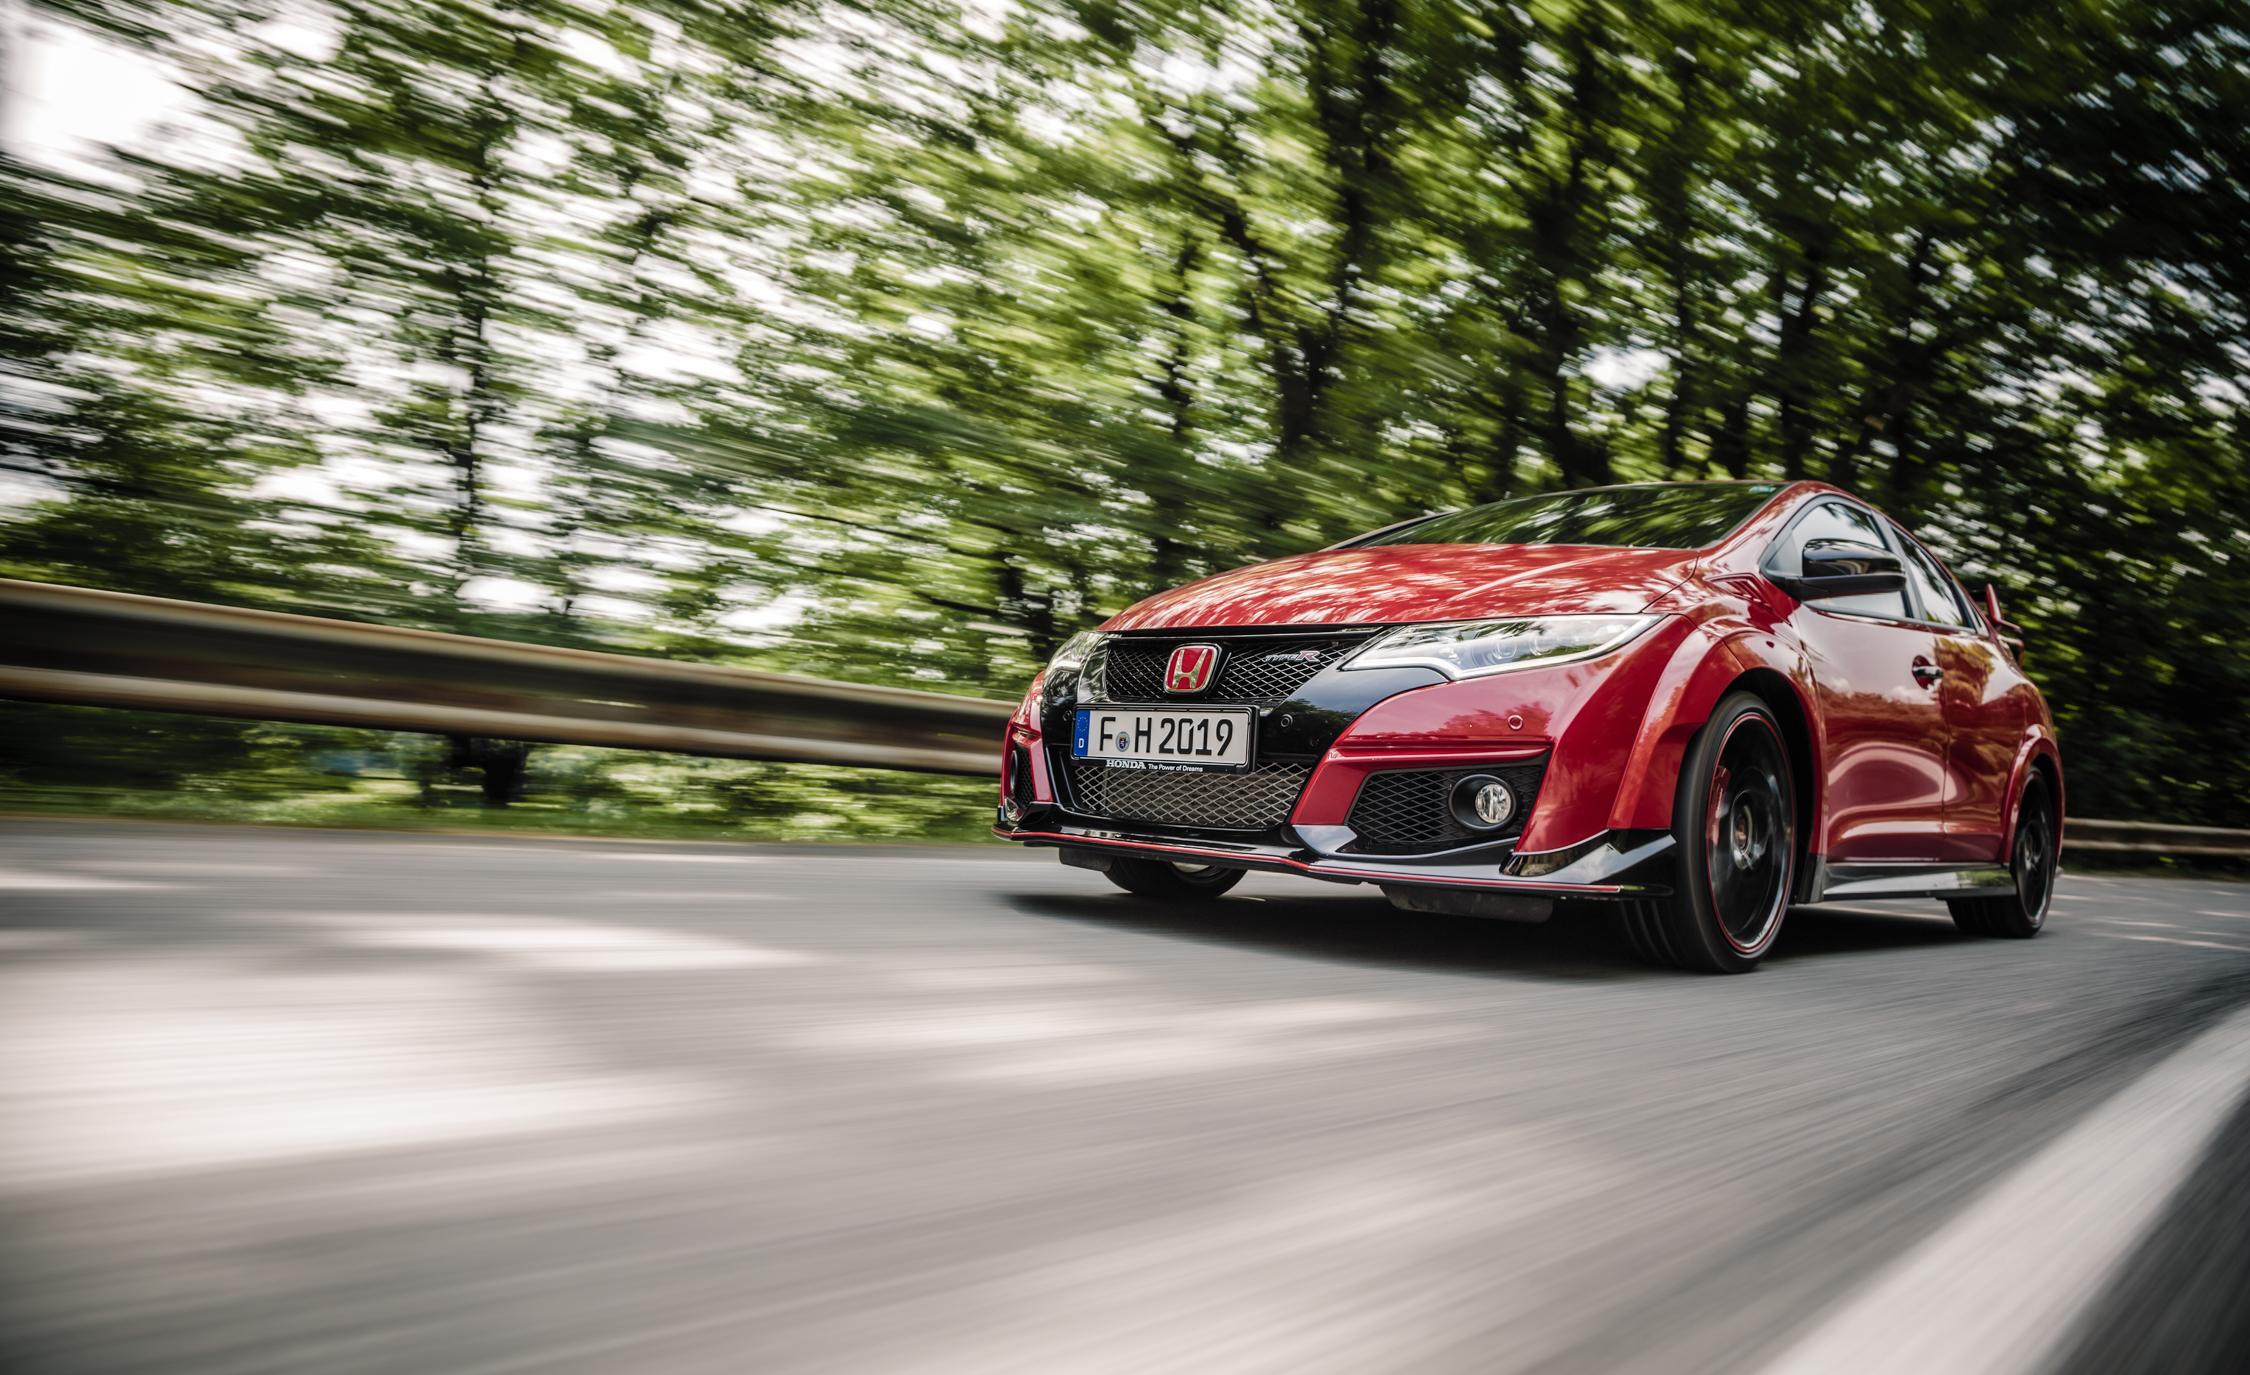 2015 Honda Civic Type R (Euro Spec) (View 10 of 34)